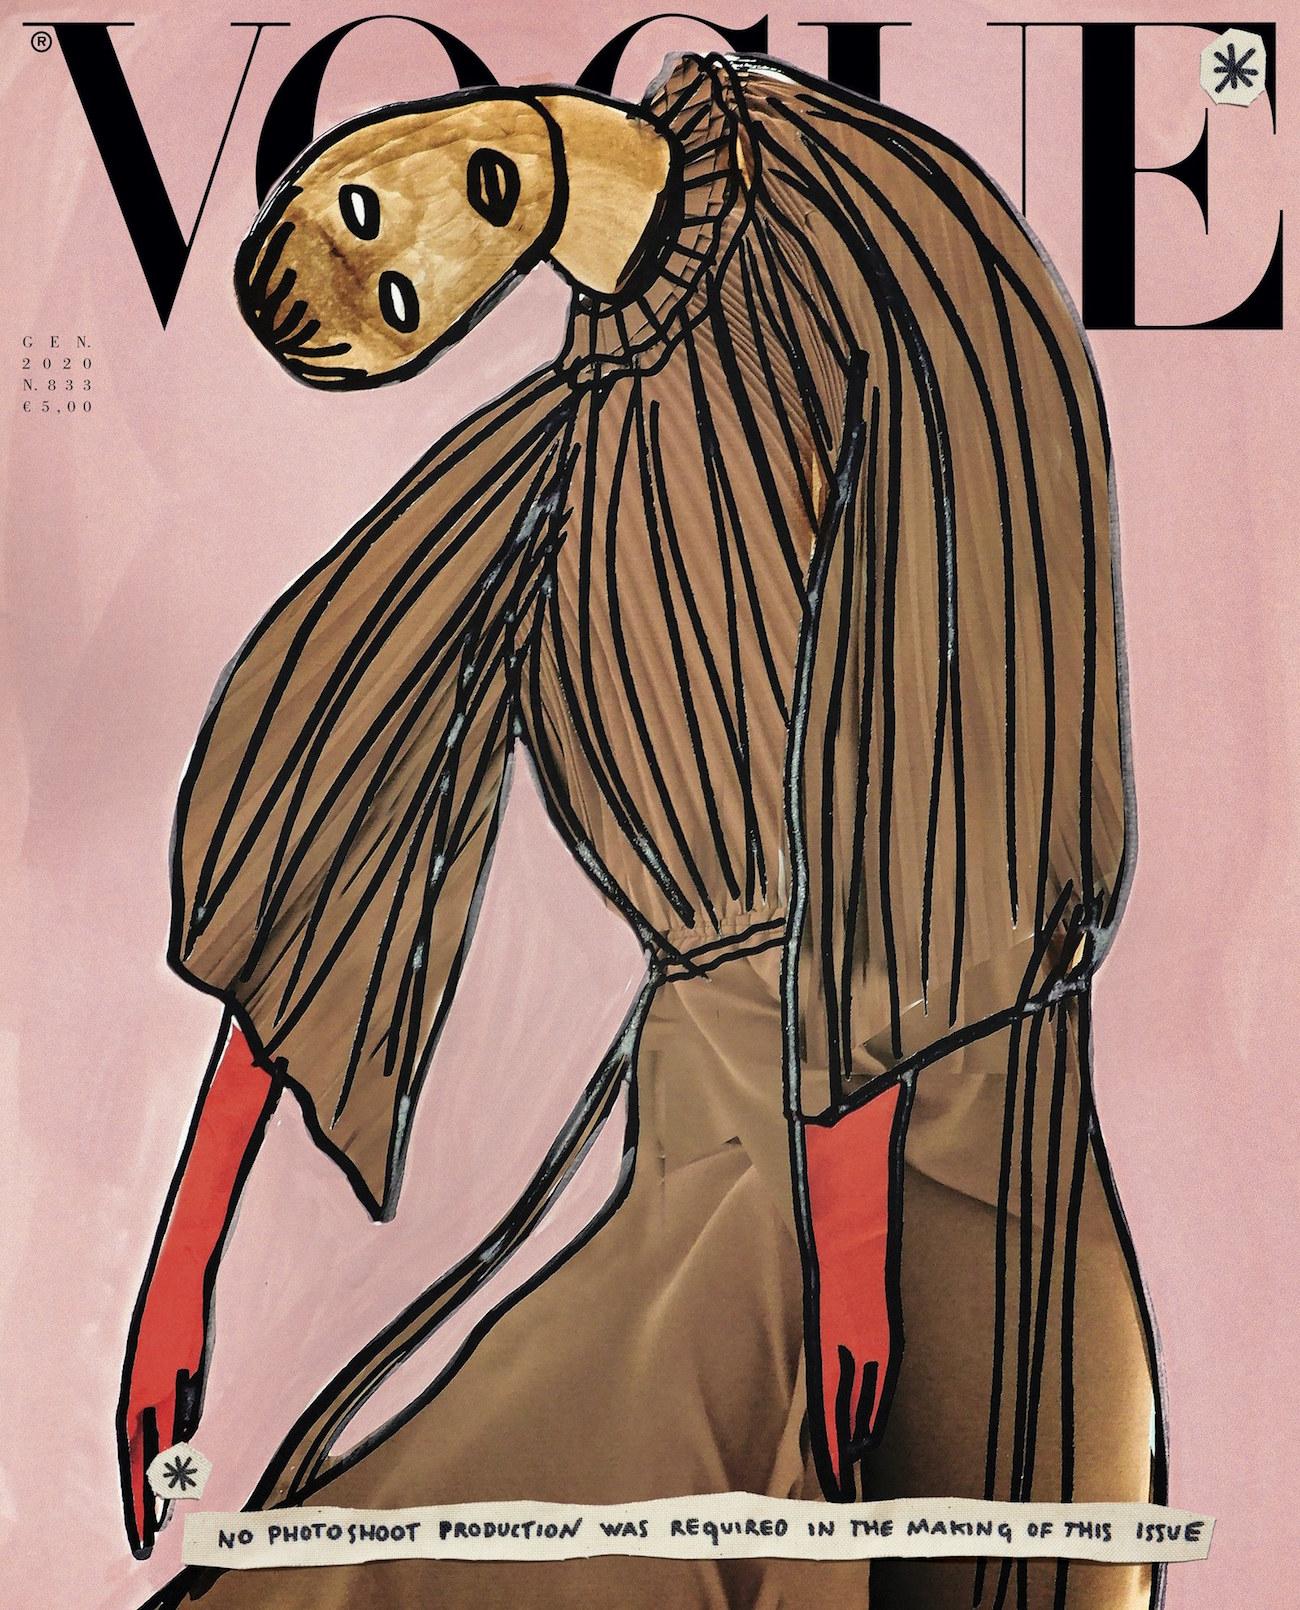 Vogue Italia geht radikalen Schritt: Illustrationen statt Fotografie